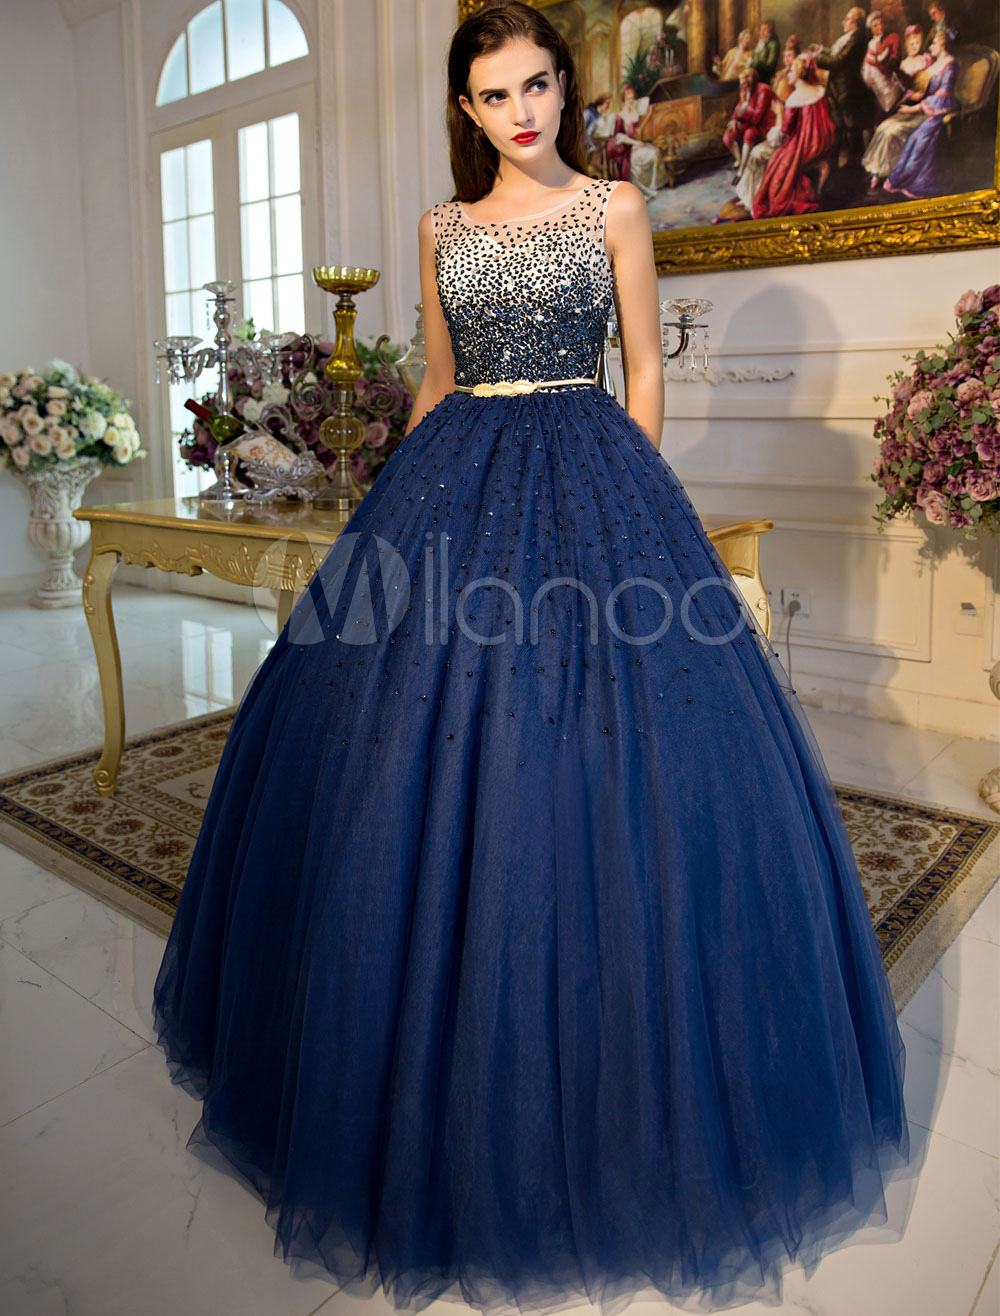 7ce17ef4d1 ... Princess Quinceanera Dresses Luxury Dark Navy Beaded Illusion  Sweetheart Floor Length Women s Pageant Dress- ...